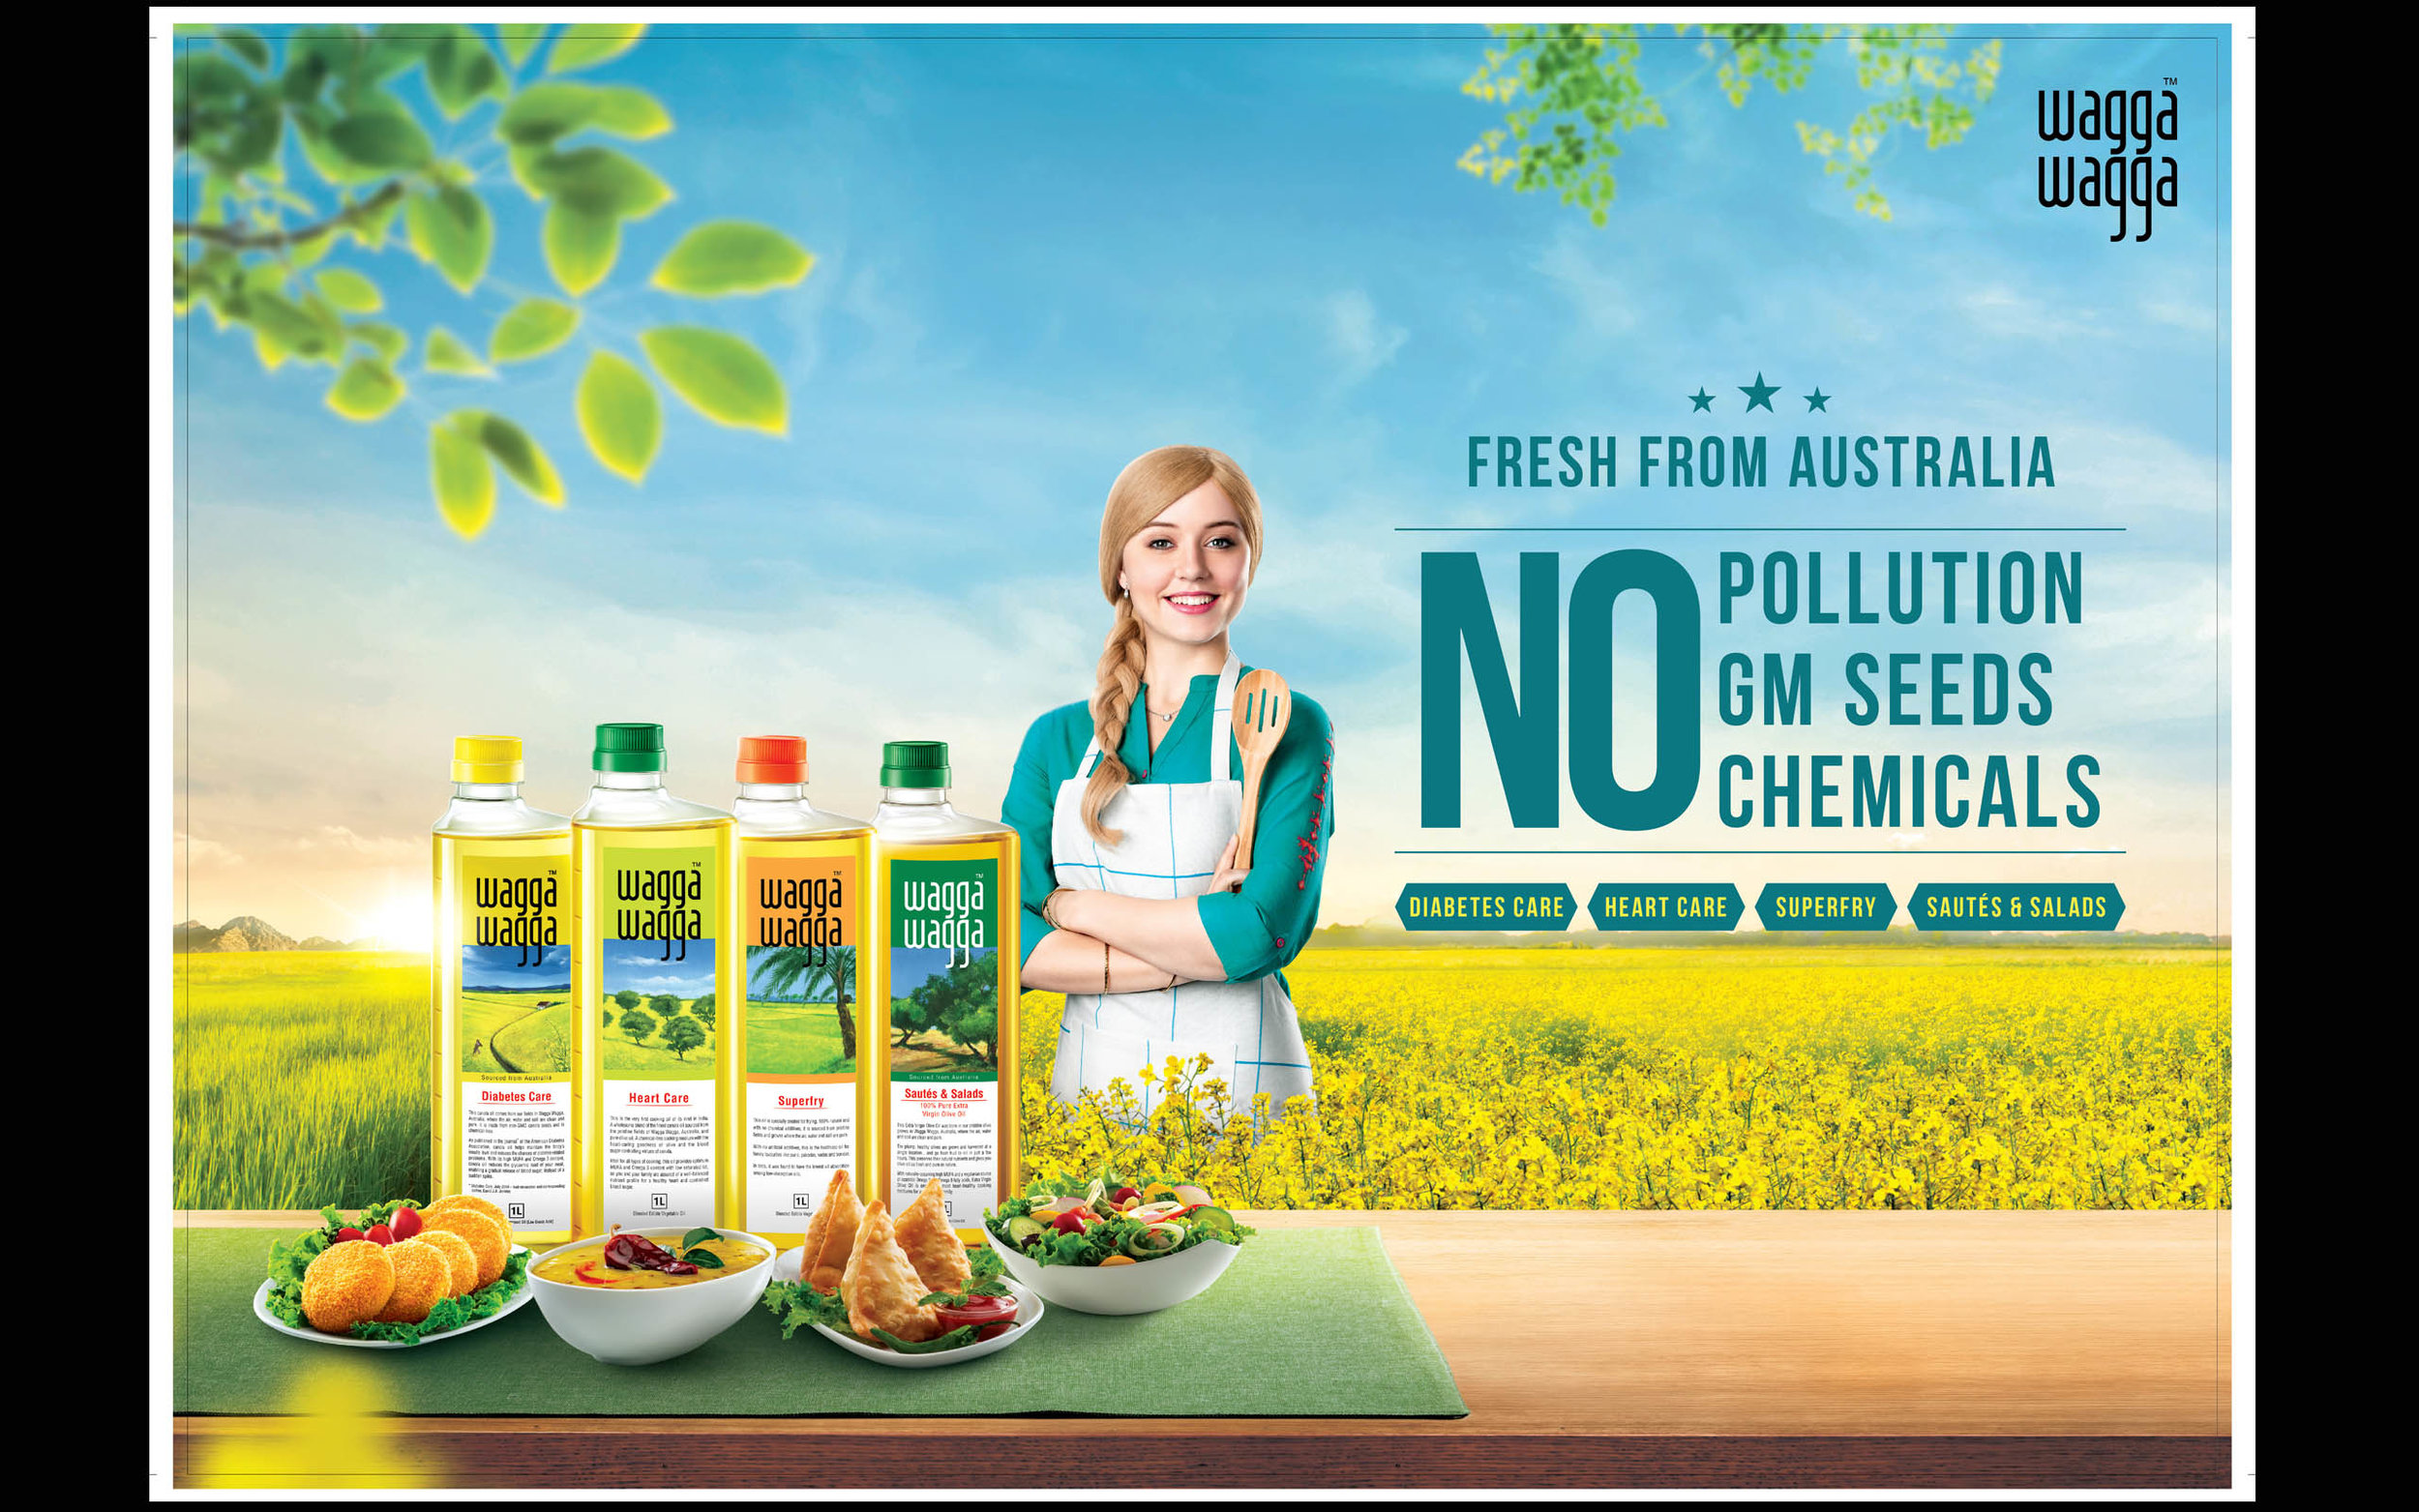 Campaign- Wagga Wagga oils